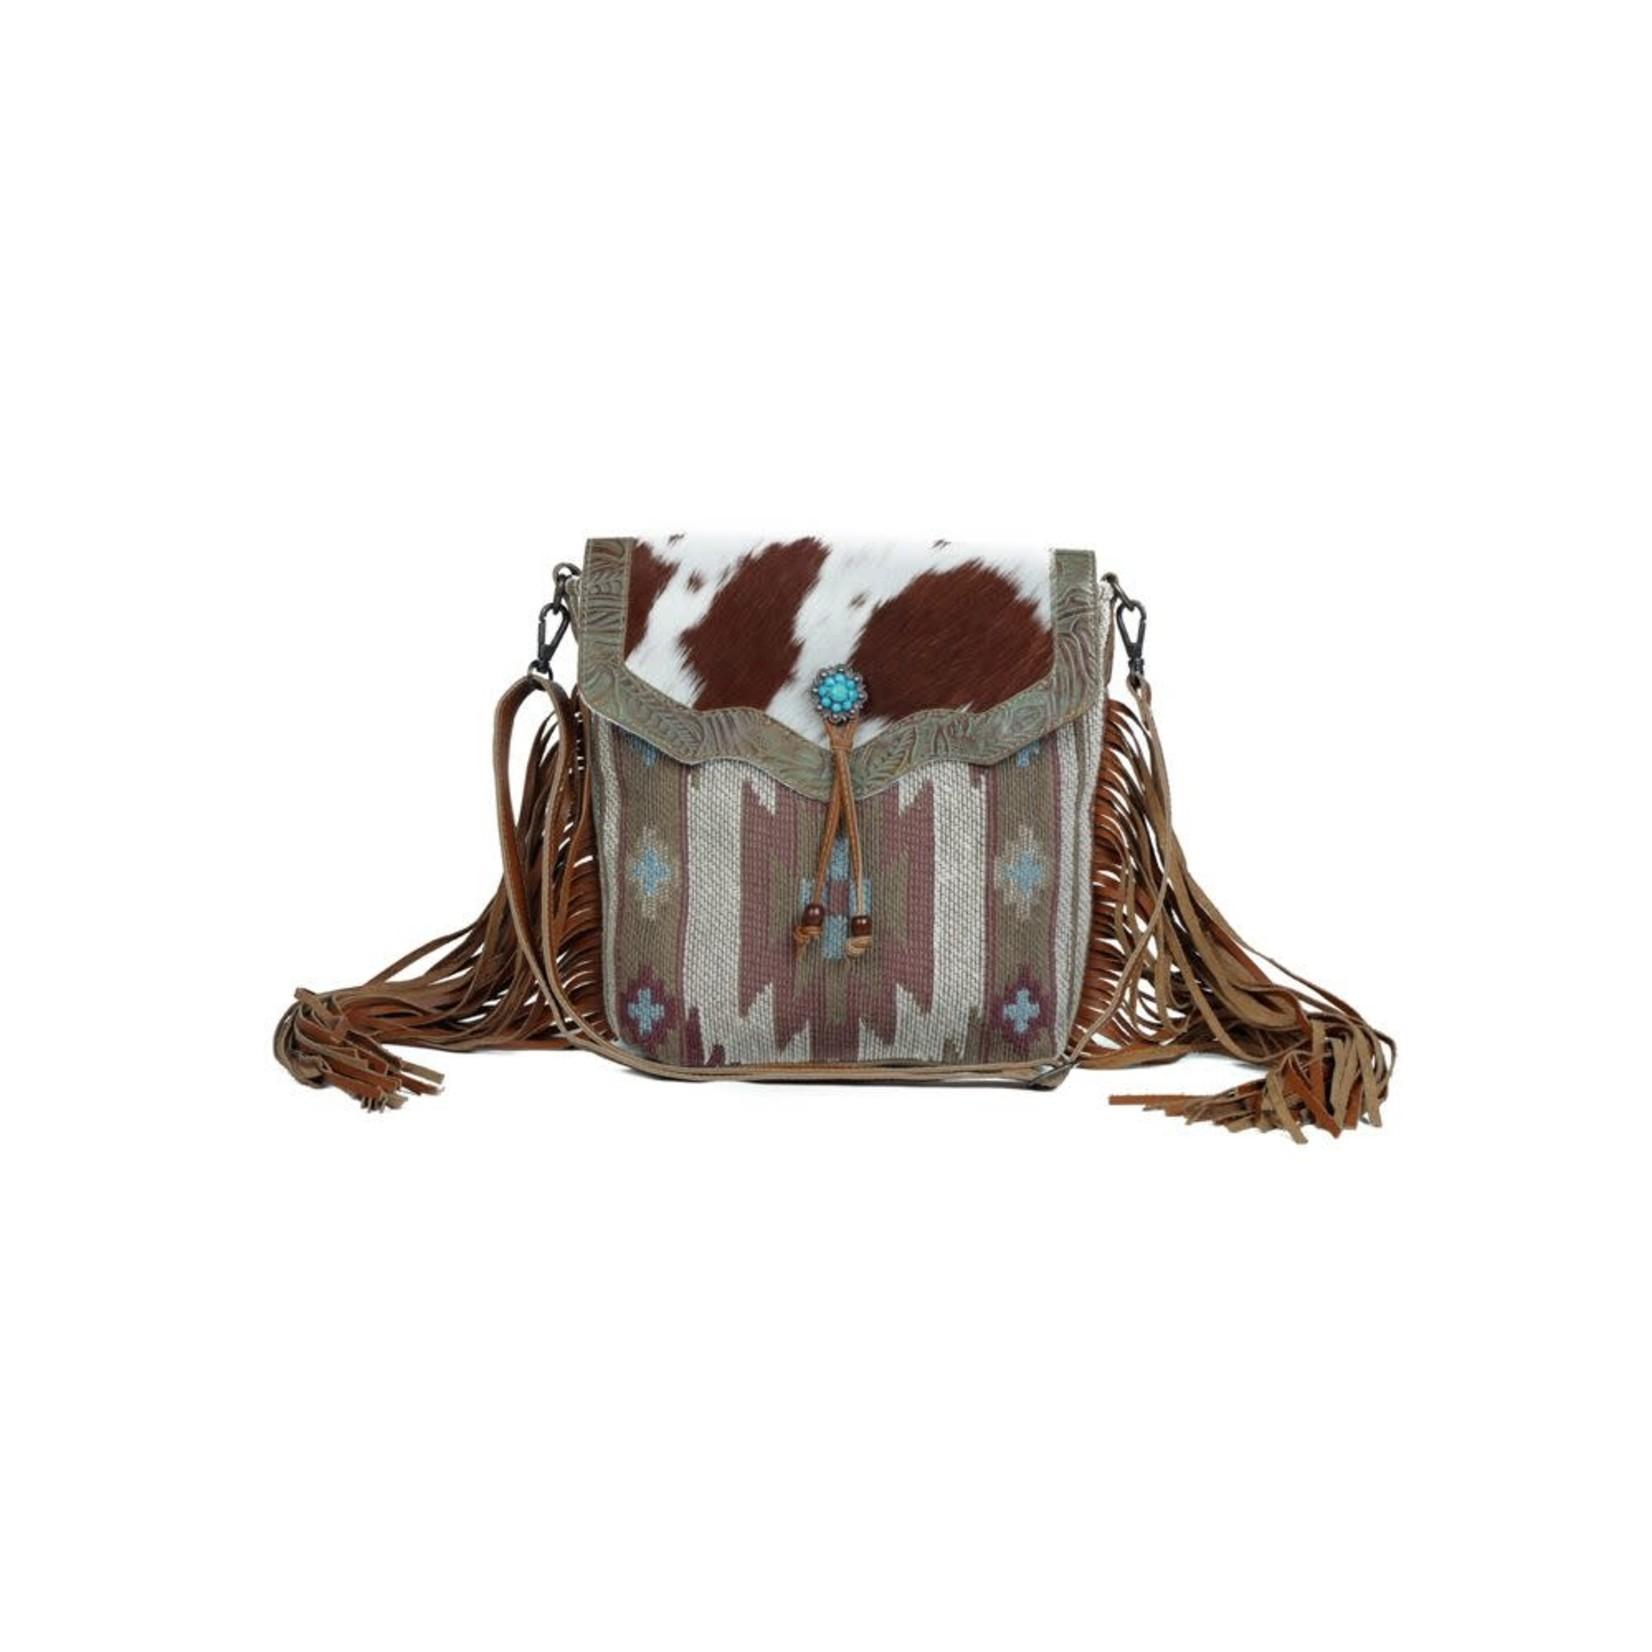 Myra Bags Myra Bags Serene Brown Handbag